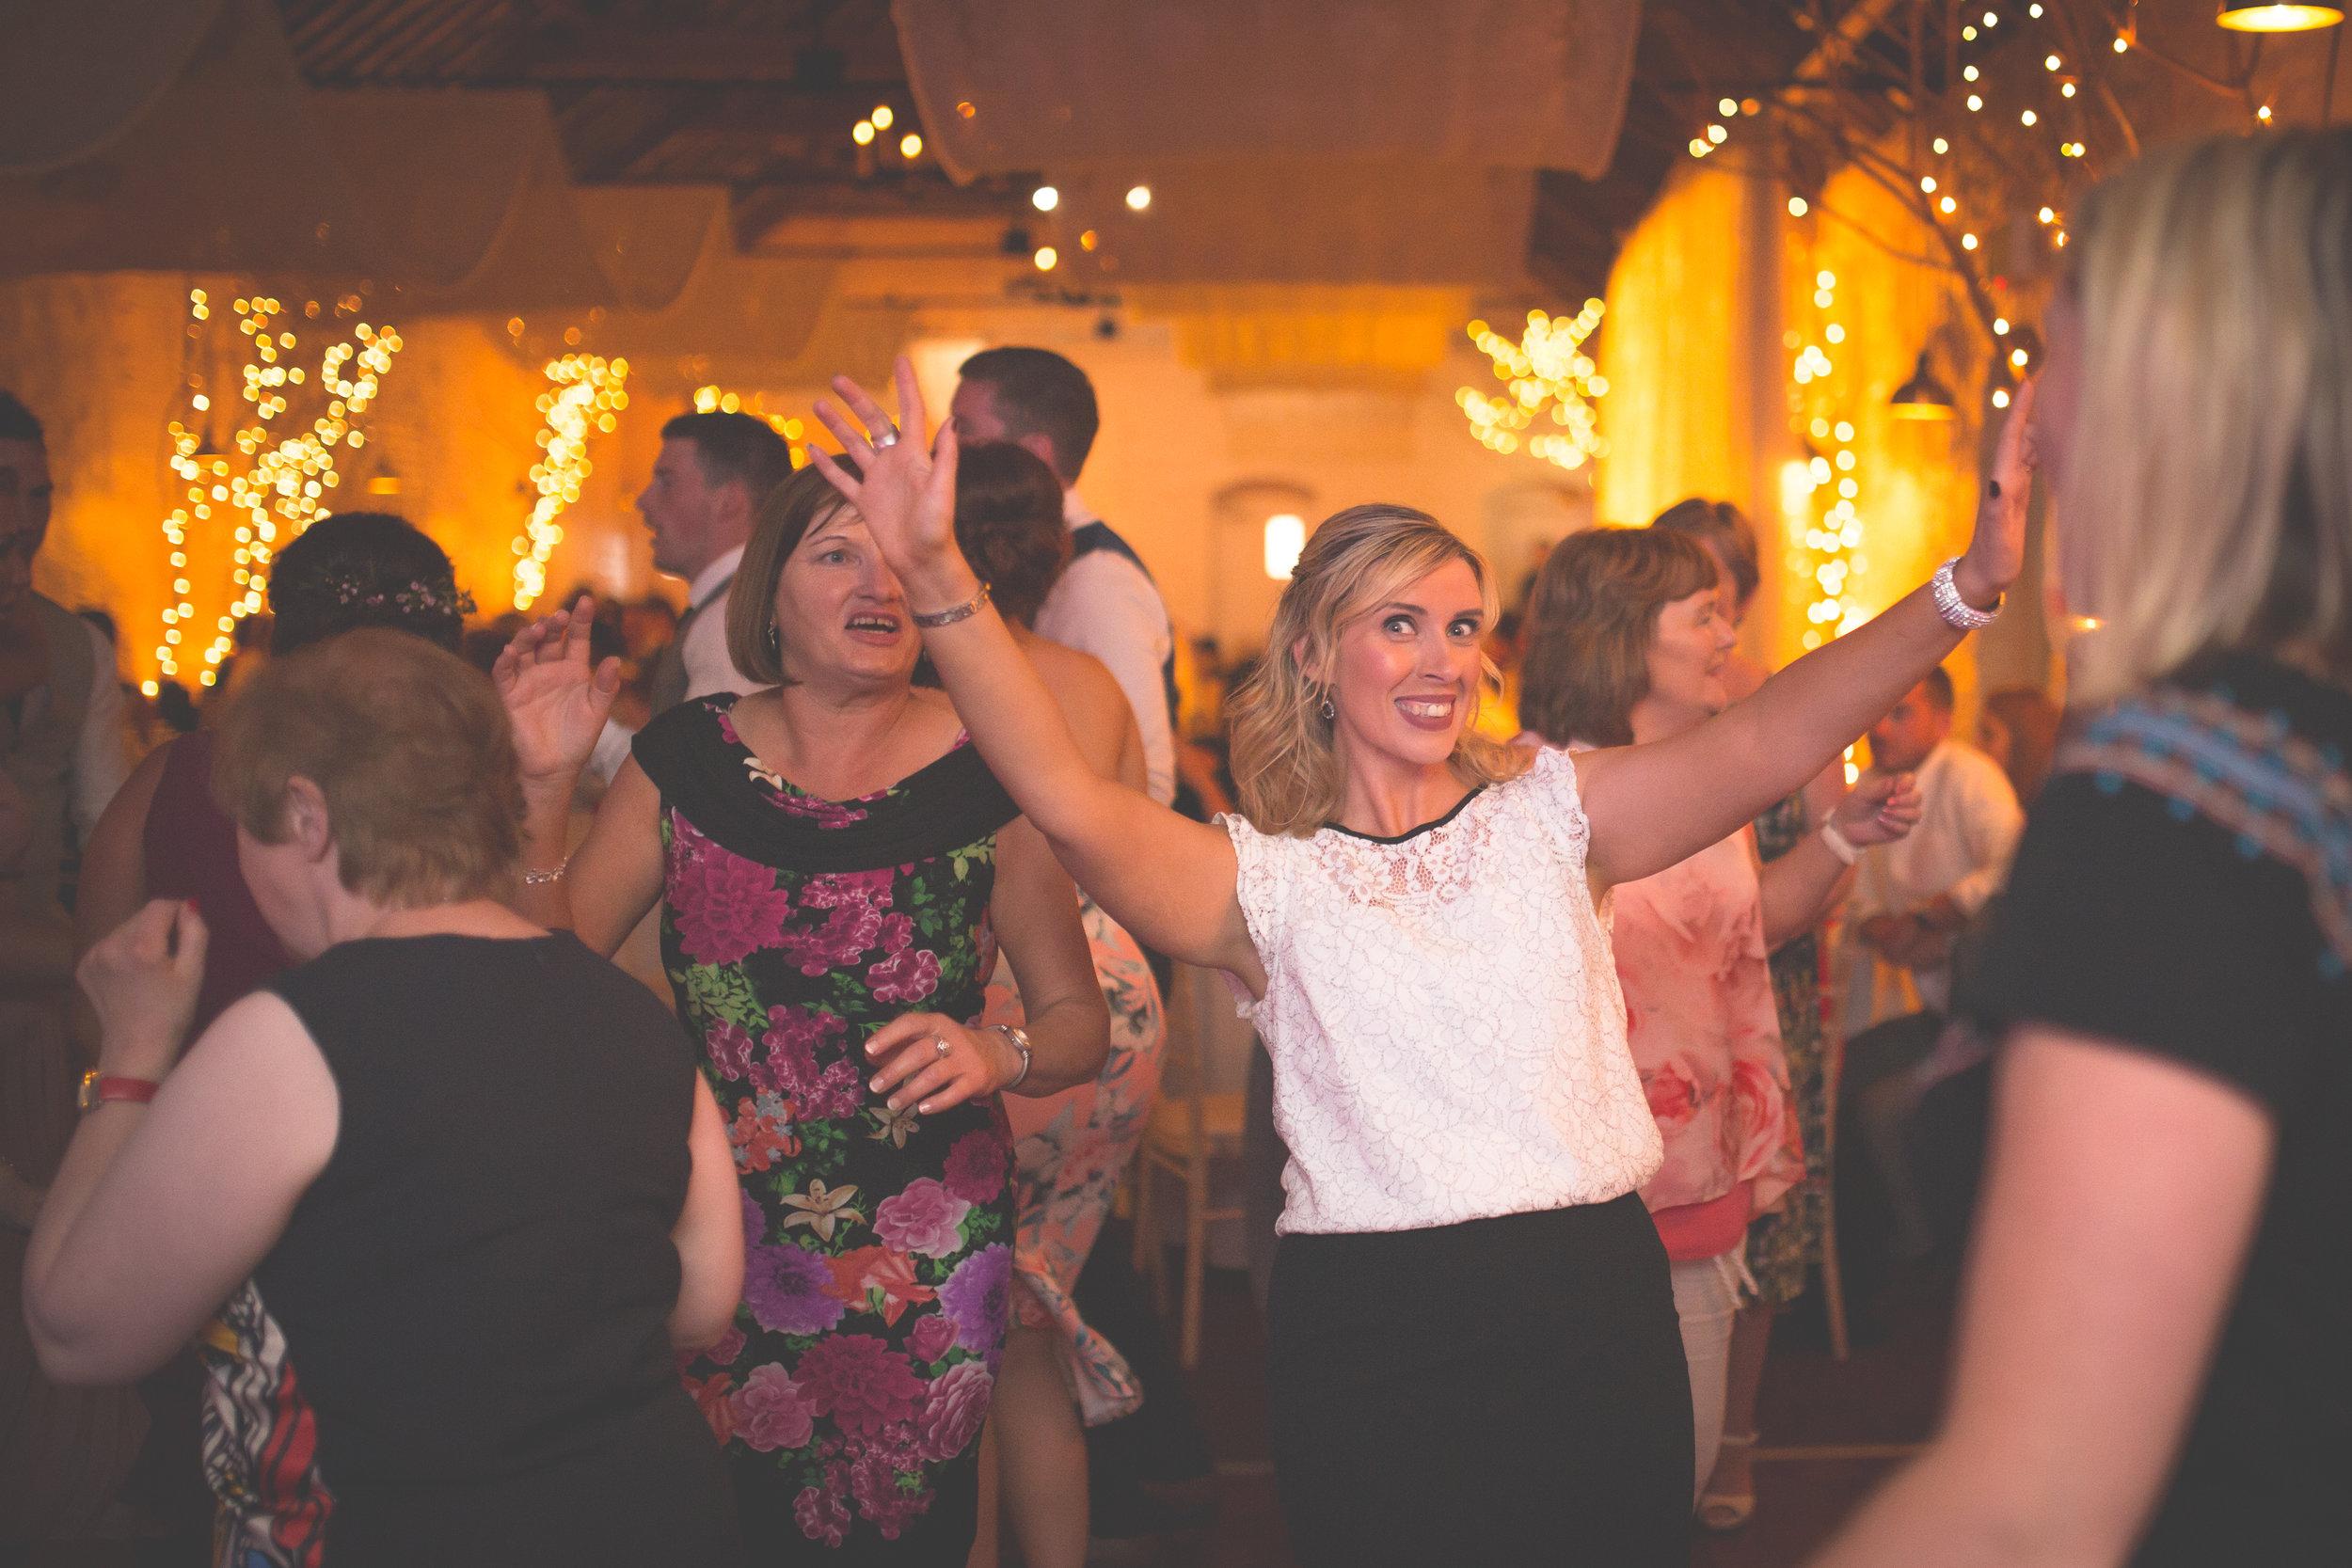 Brian McEwan Wedding Photography | Carol-Annee & Sean | The Dancing-97.jpg